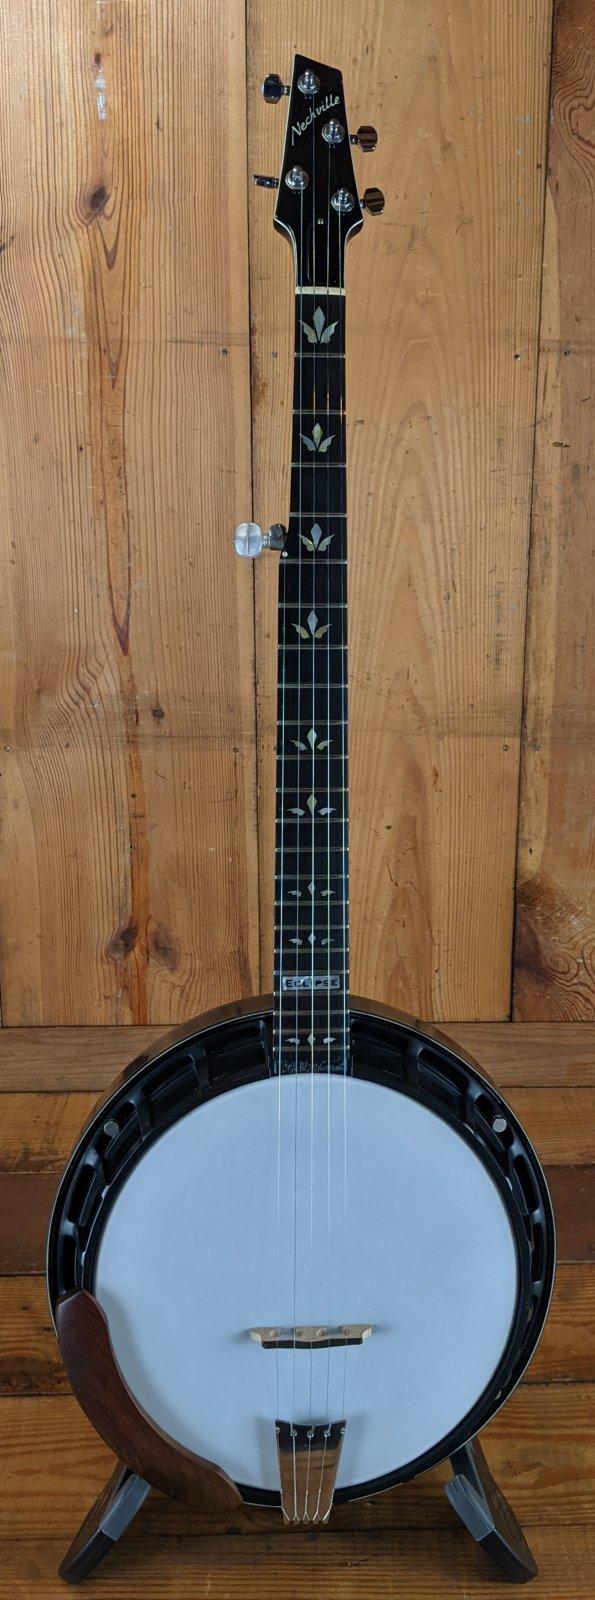 2010 Nechville Eclipse Deluxe 5-String Banjo